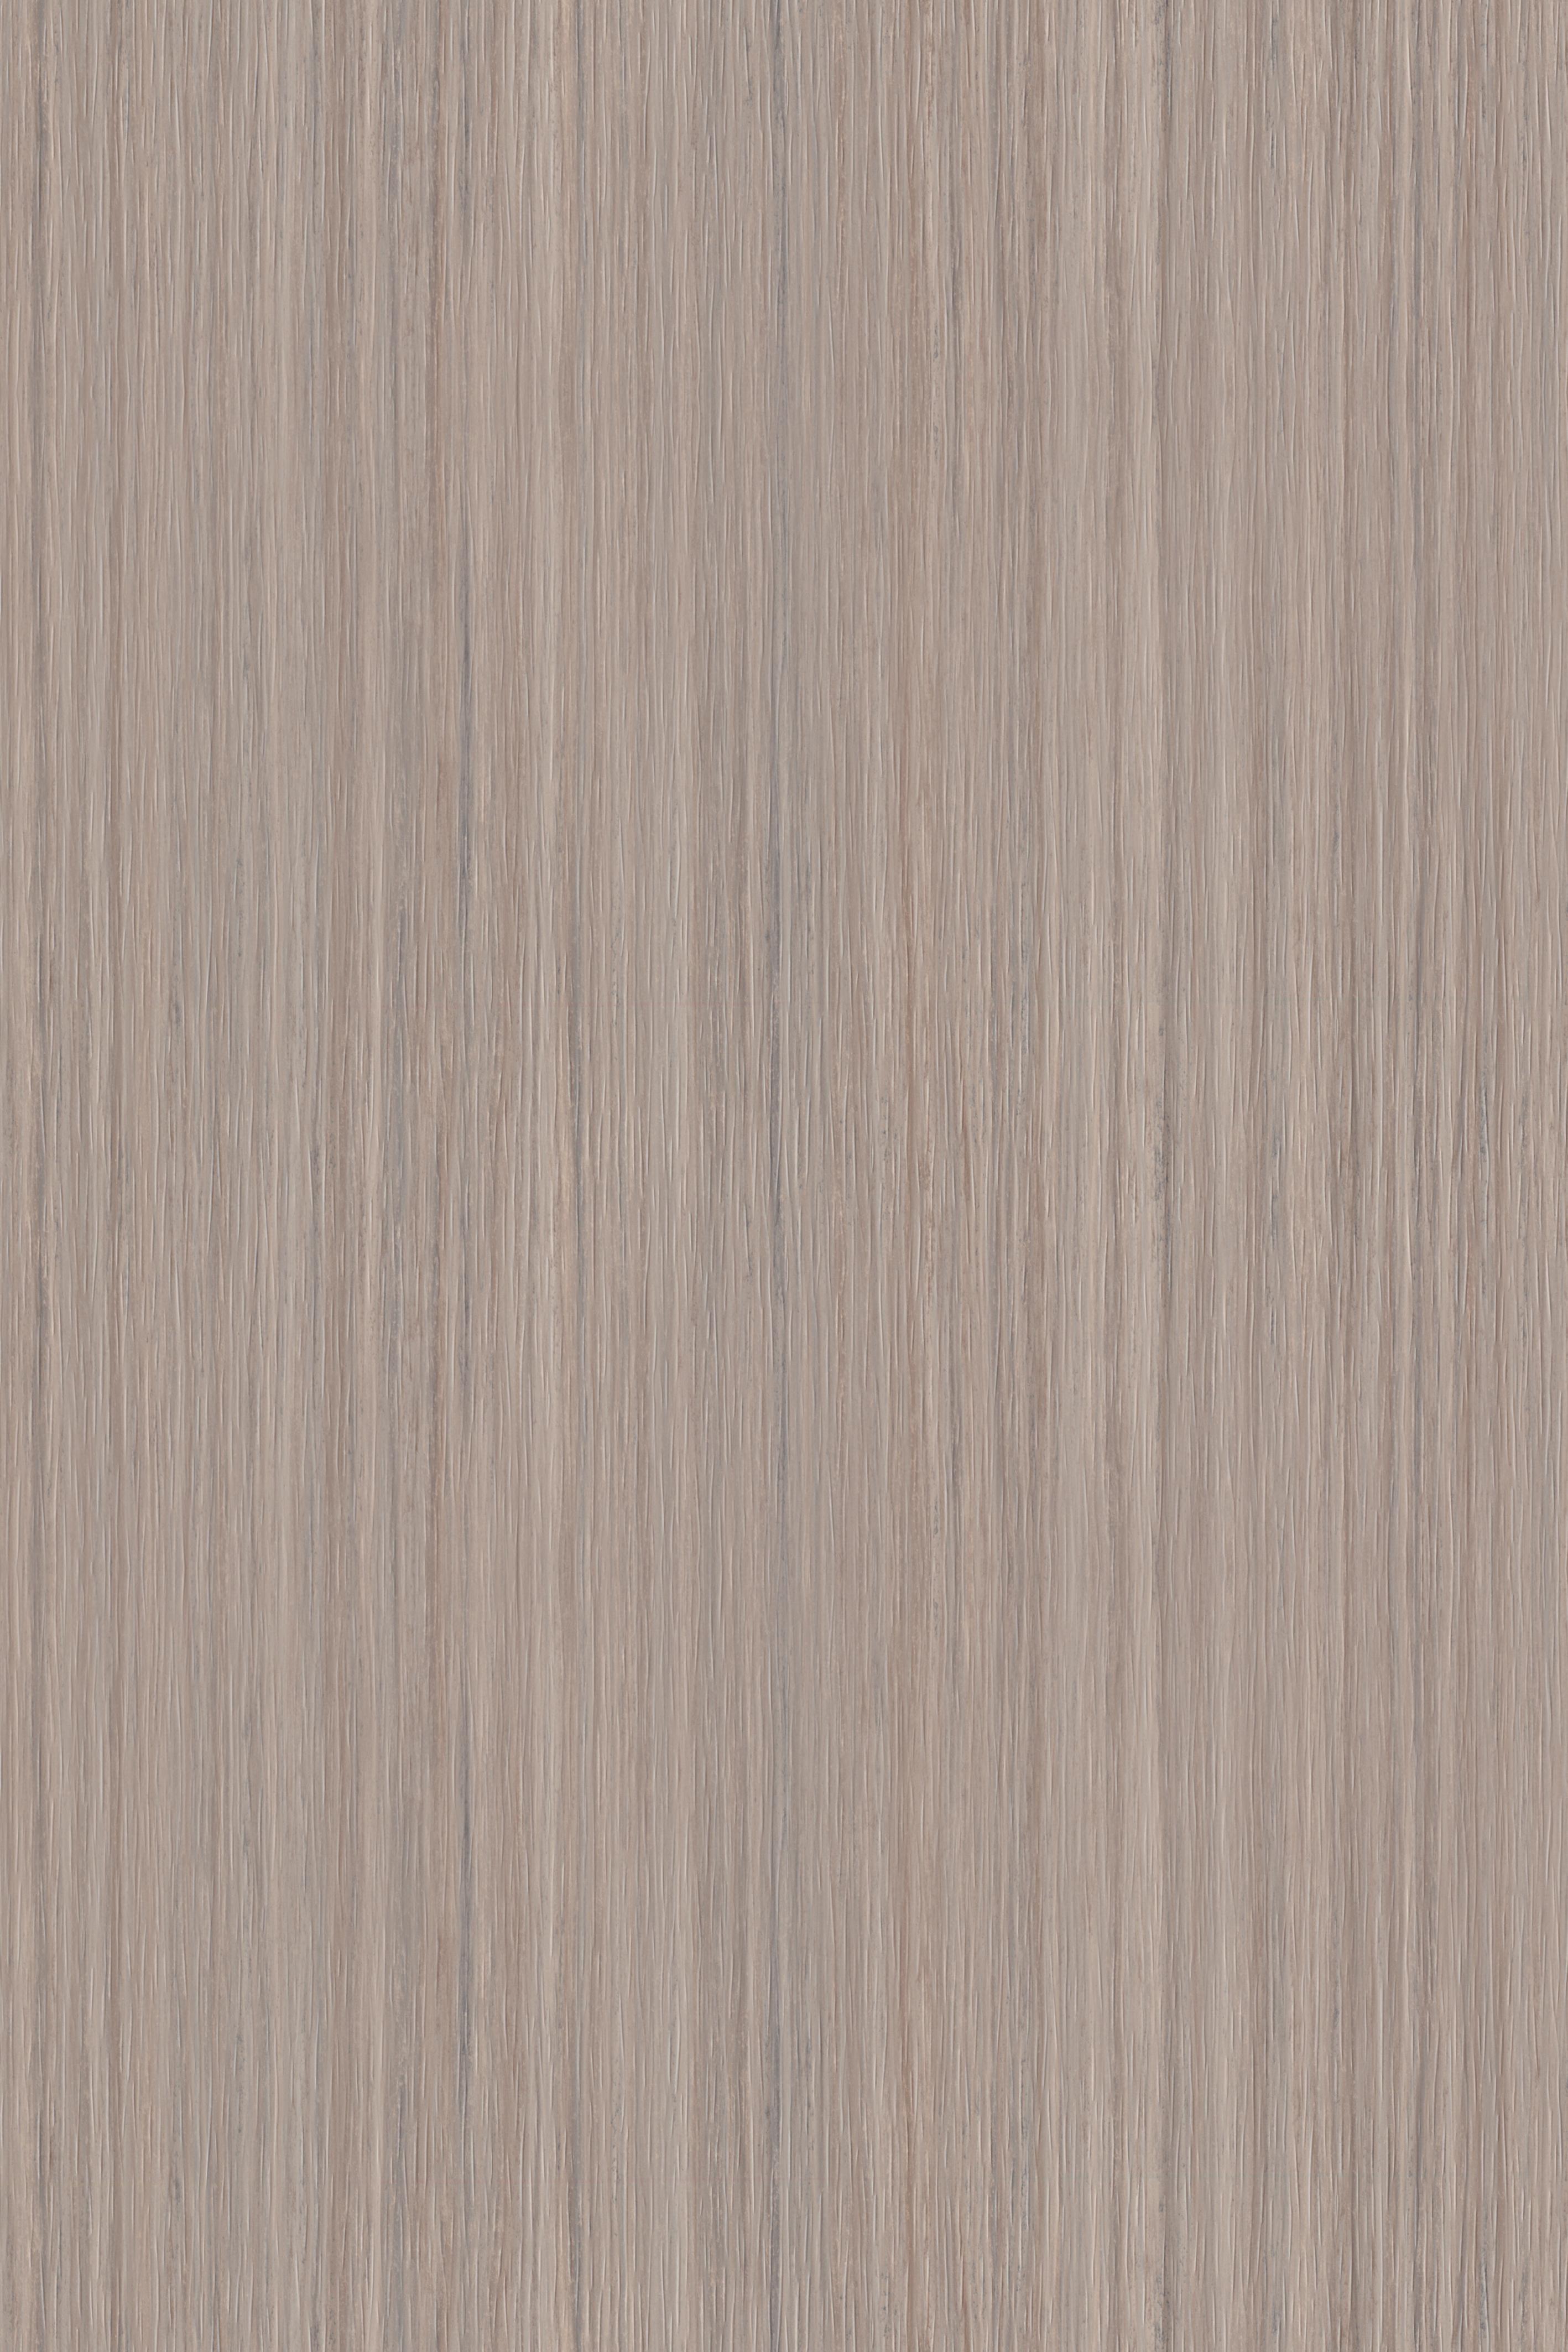 Marmoleum Striato Textura Forbo Flooring Systems